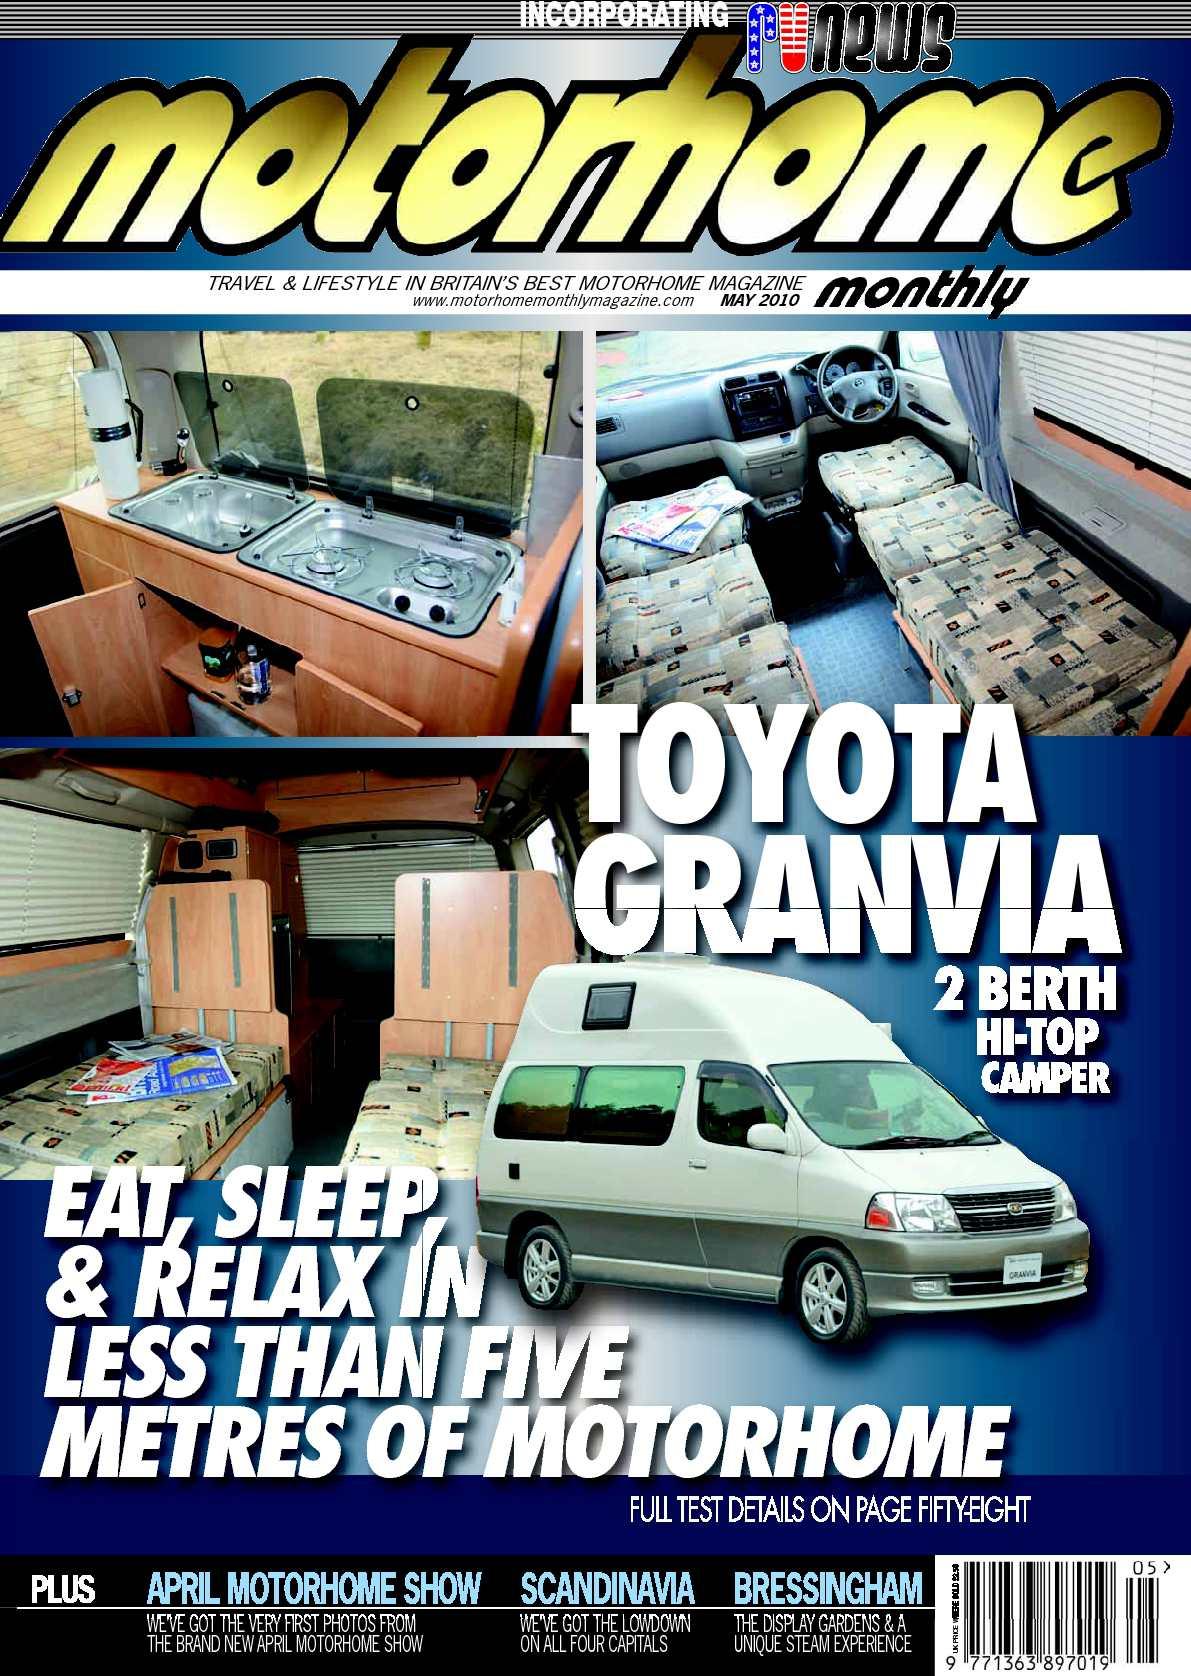 bd7bcddd9521eb Calaméo - May 2010 - Motorhome Monthly Magazine